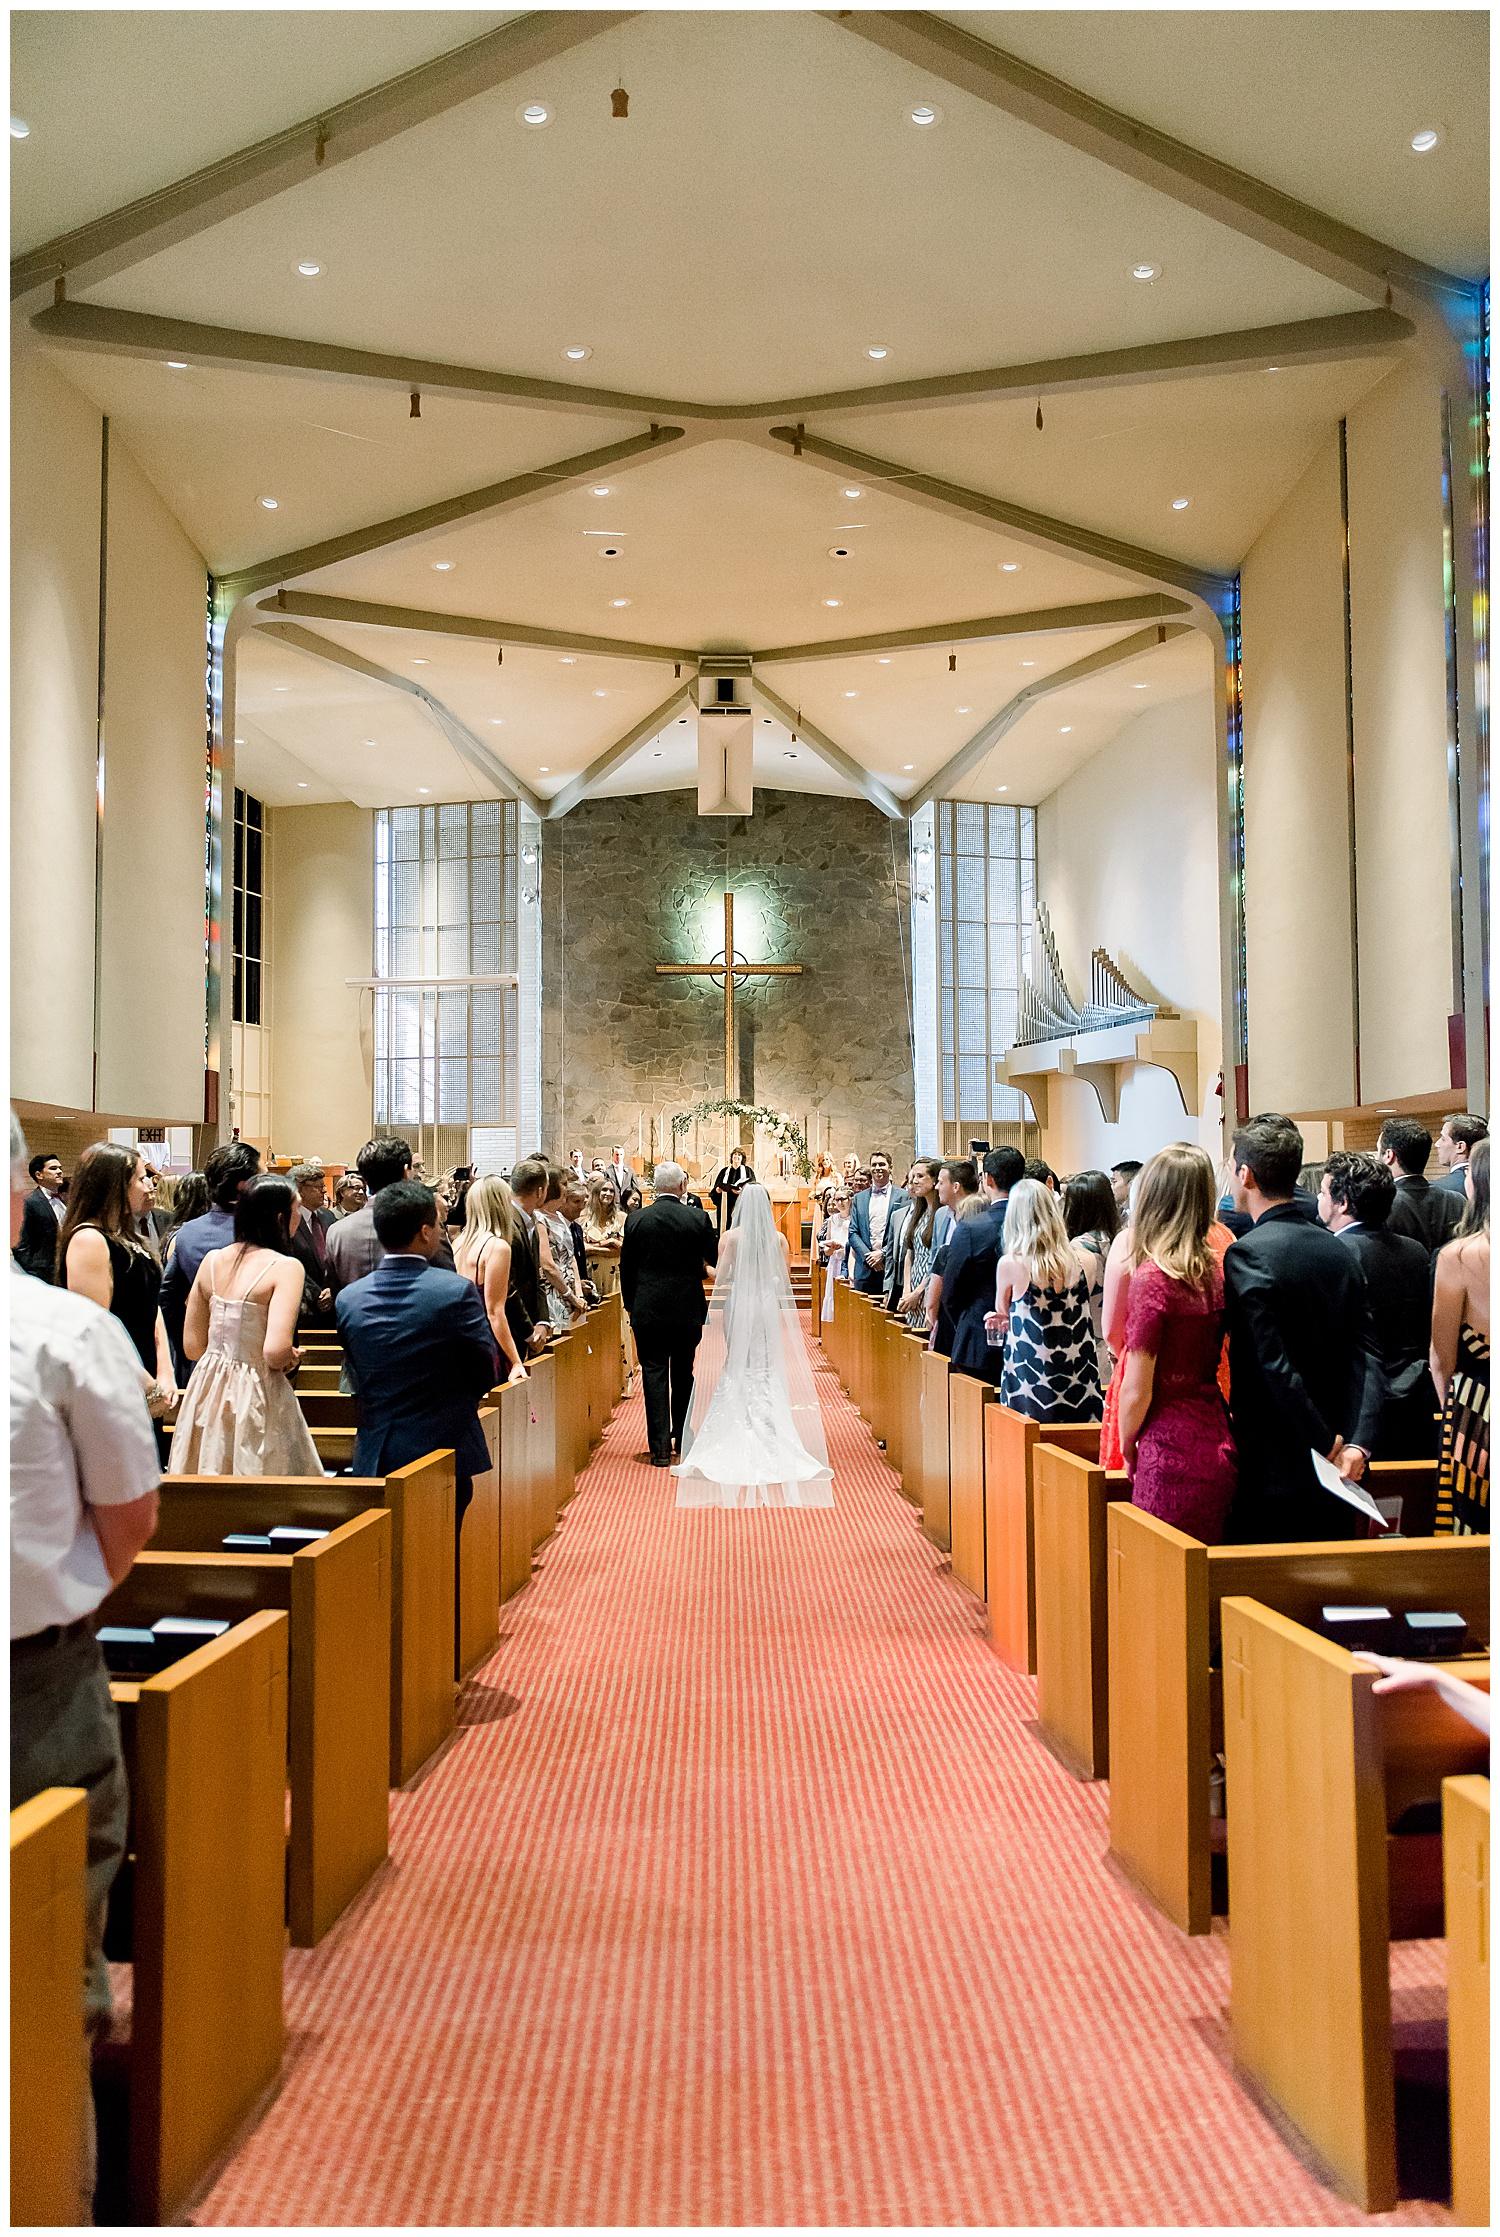 Janine_Licare_Photography_San_Francisco_Wedding_Photographer_Southern_California_0037.jpg